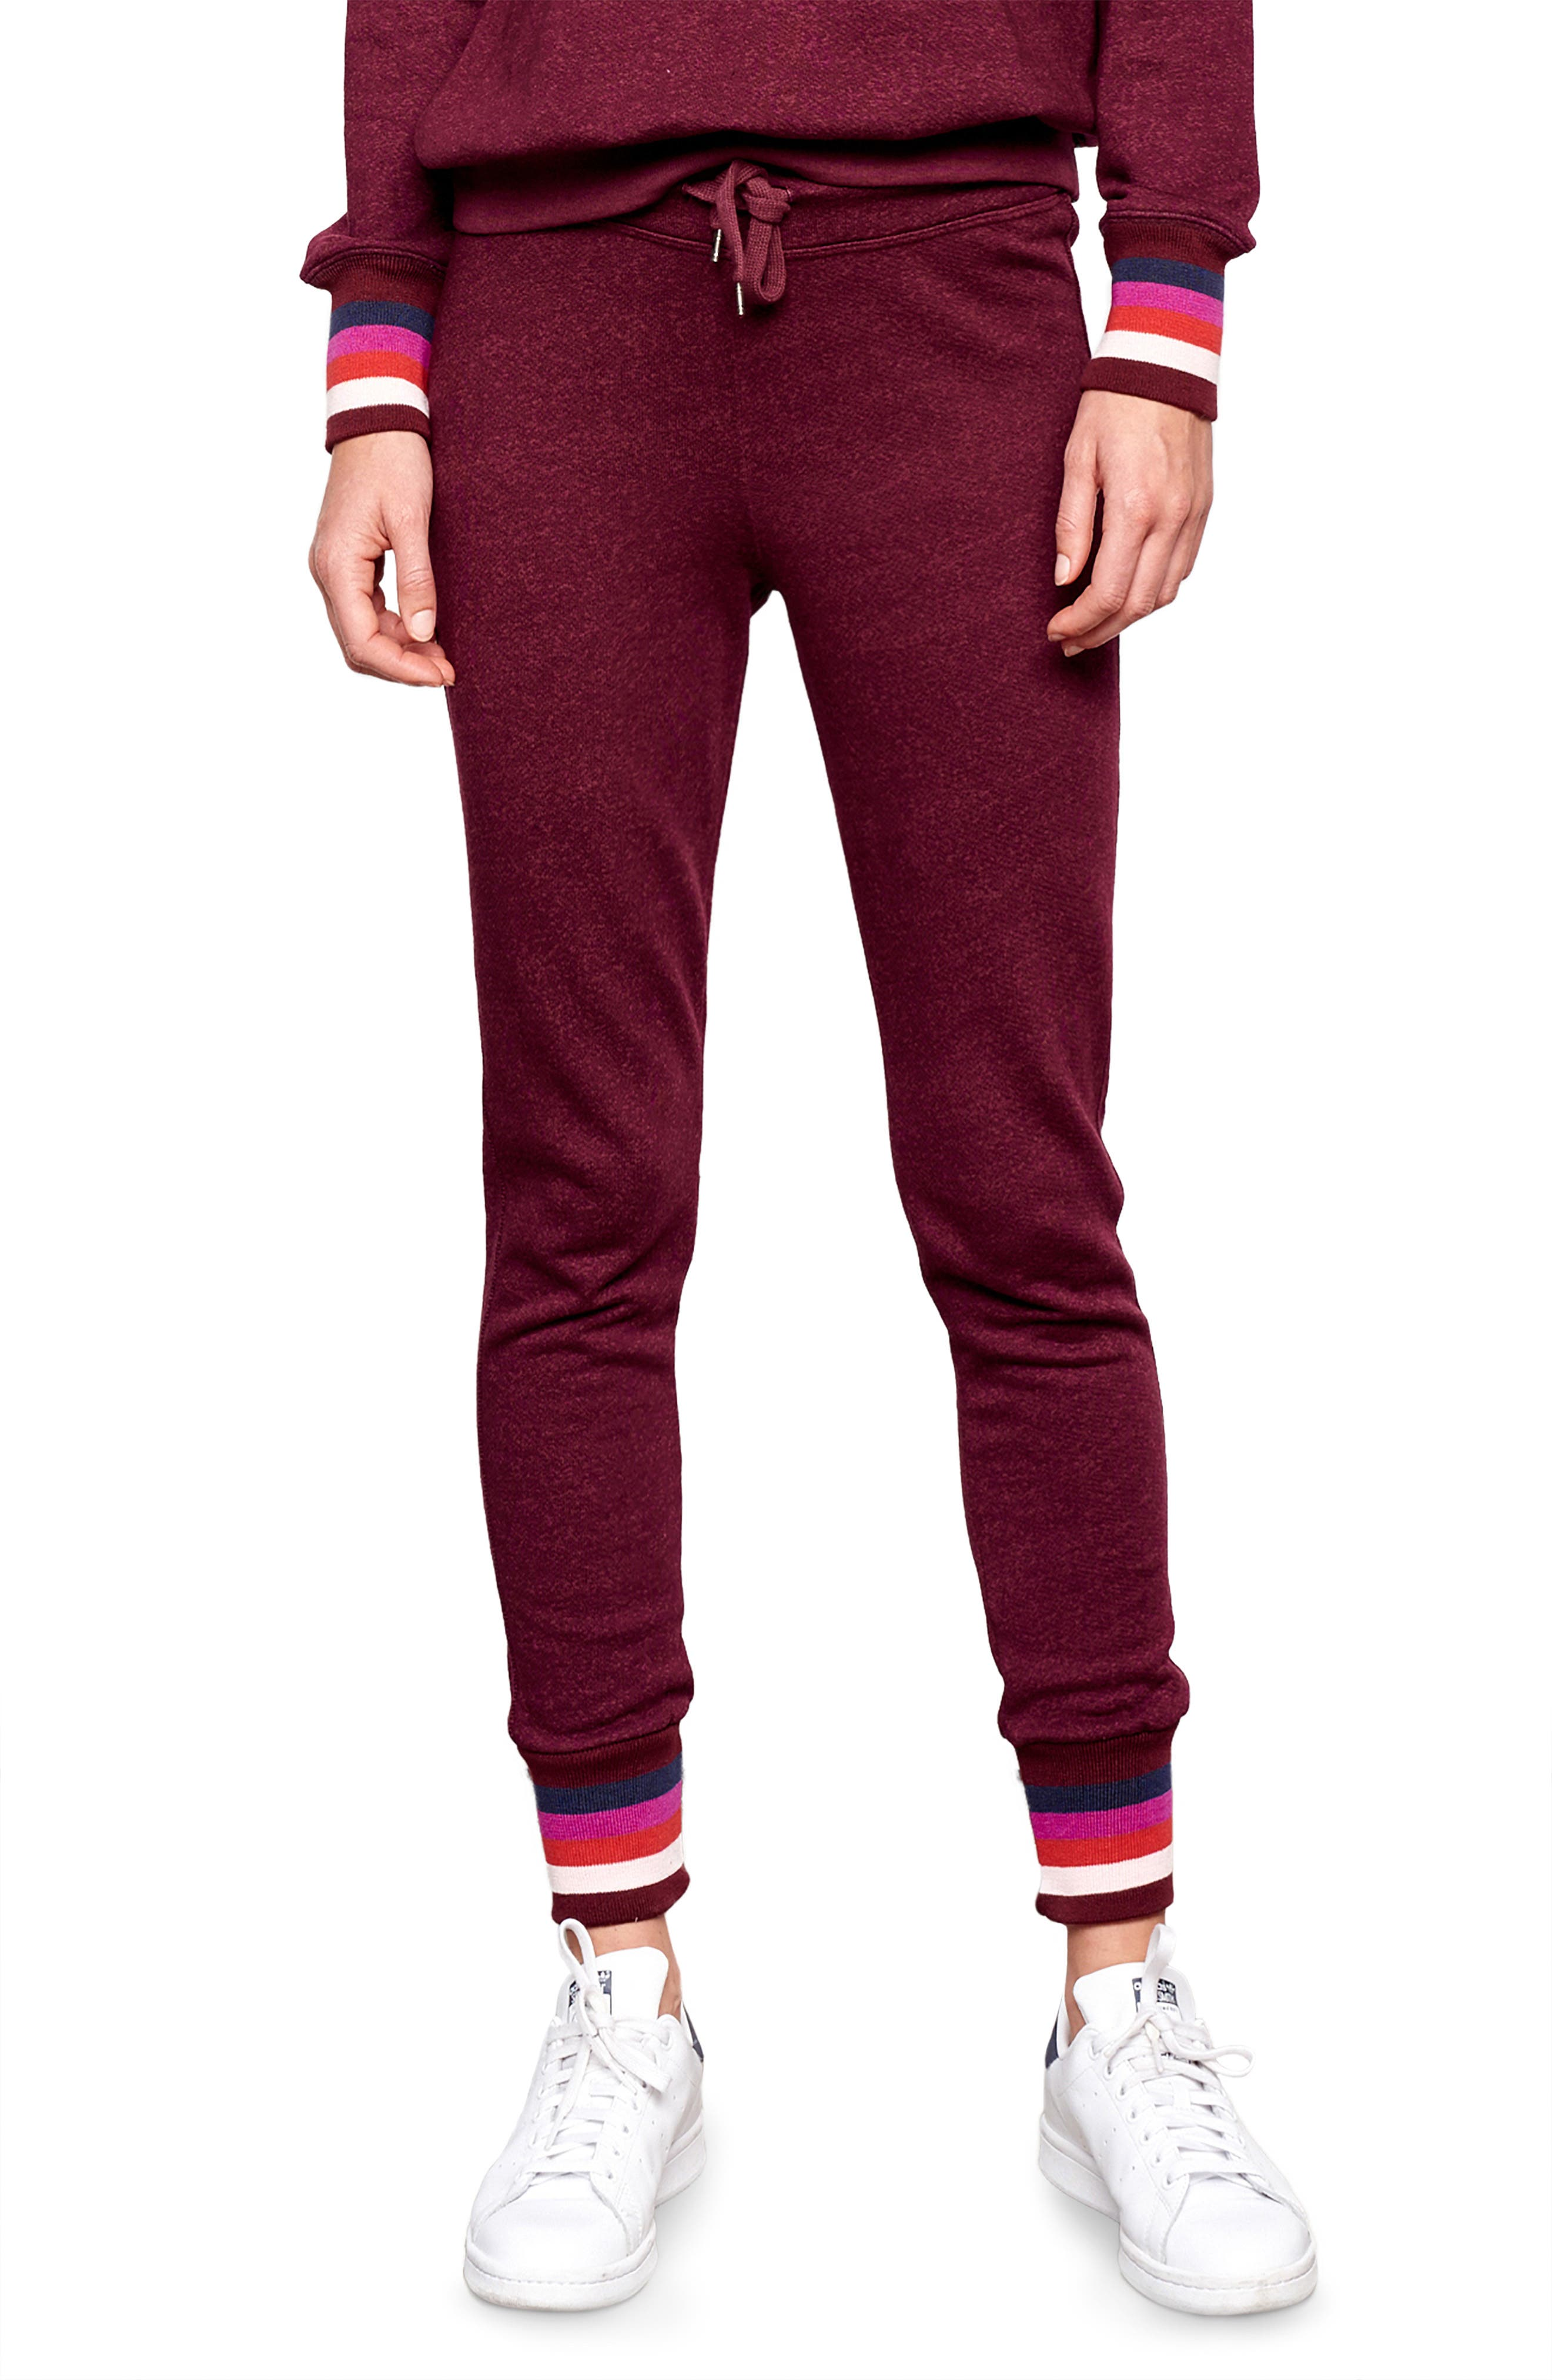 Stripe Cuff Sweatpants, Main, color, 930